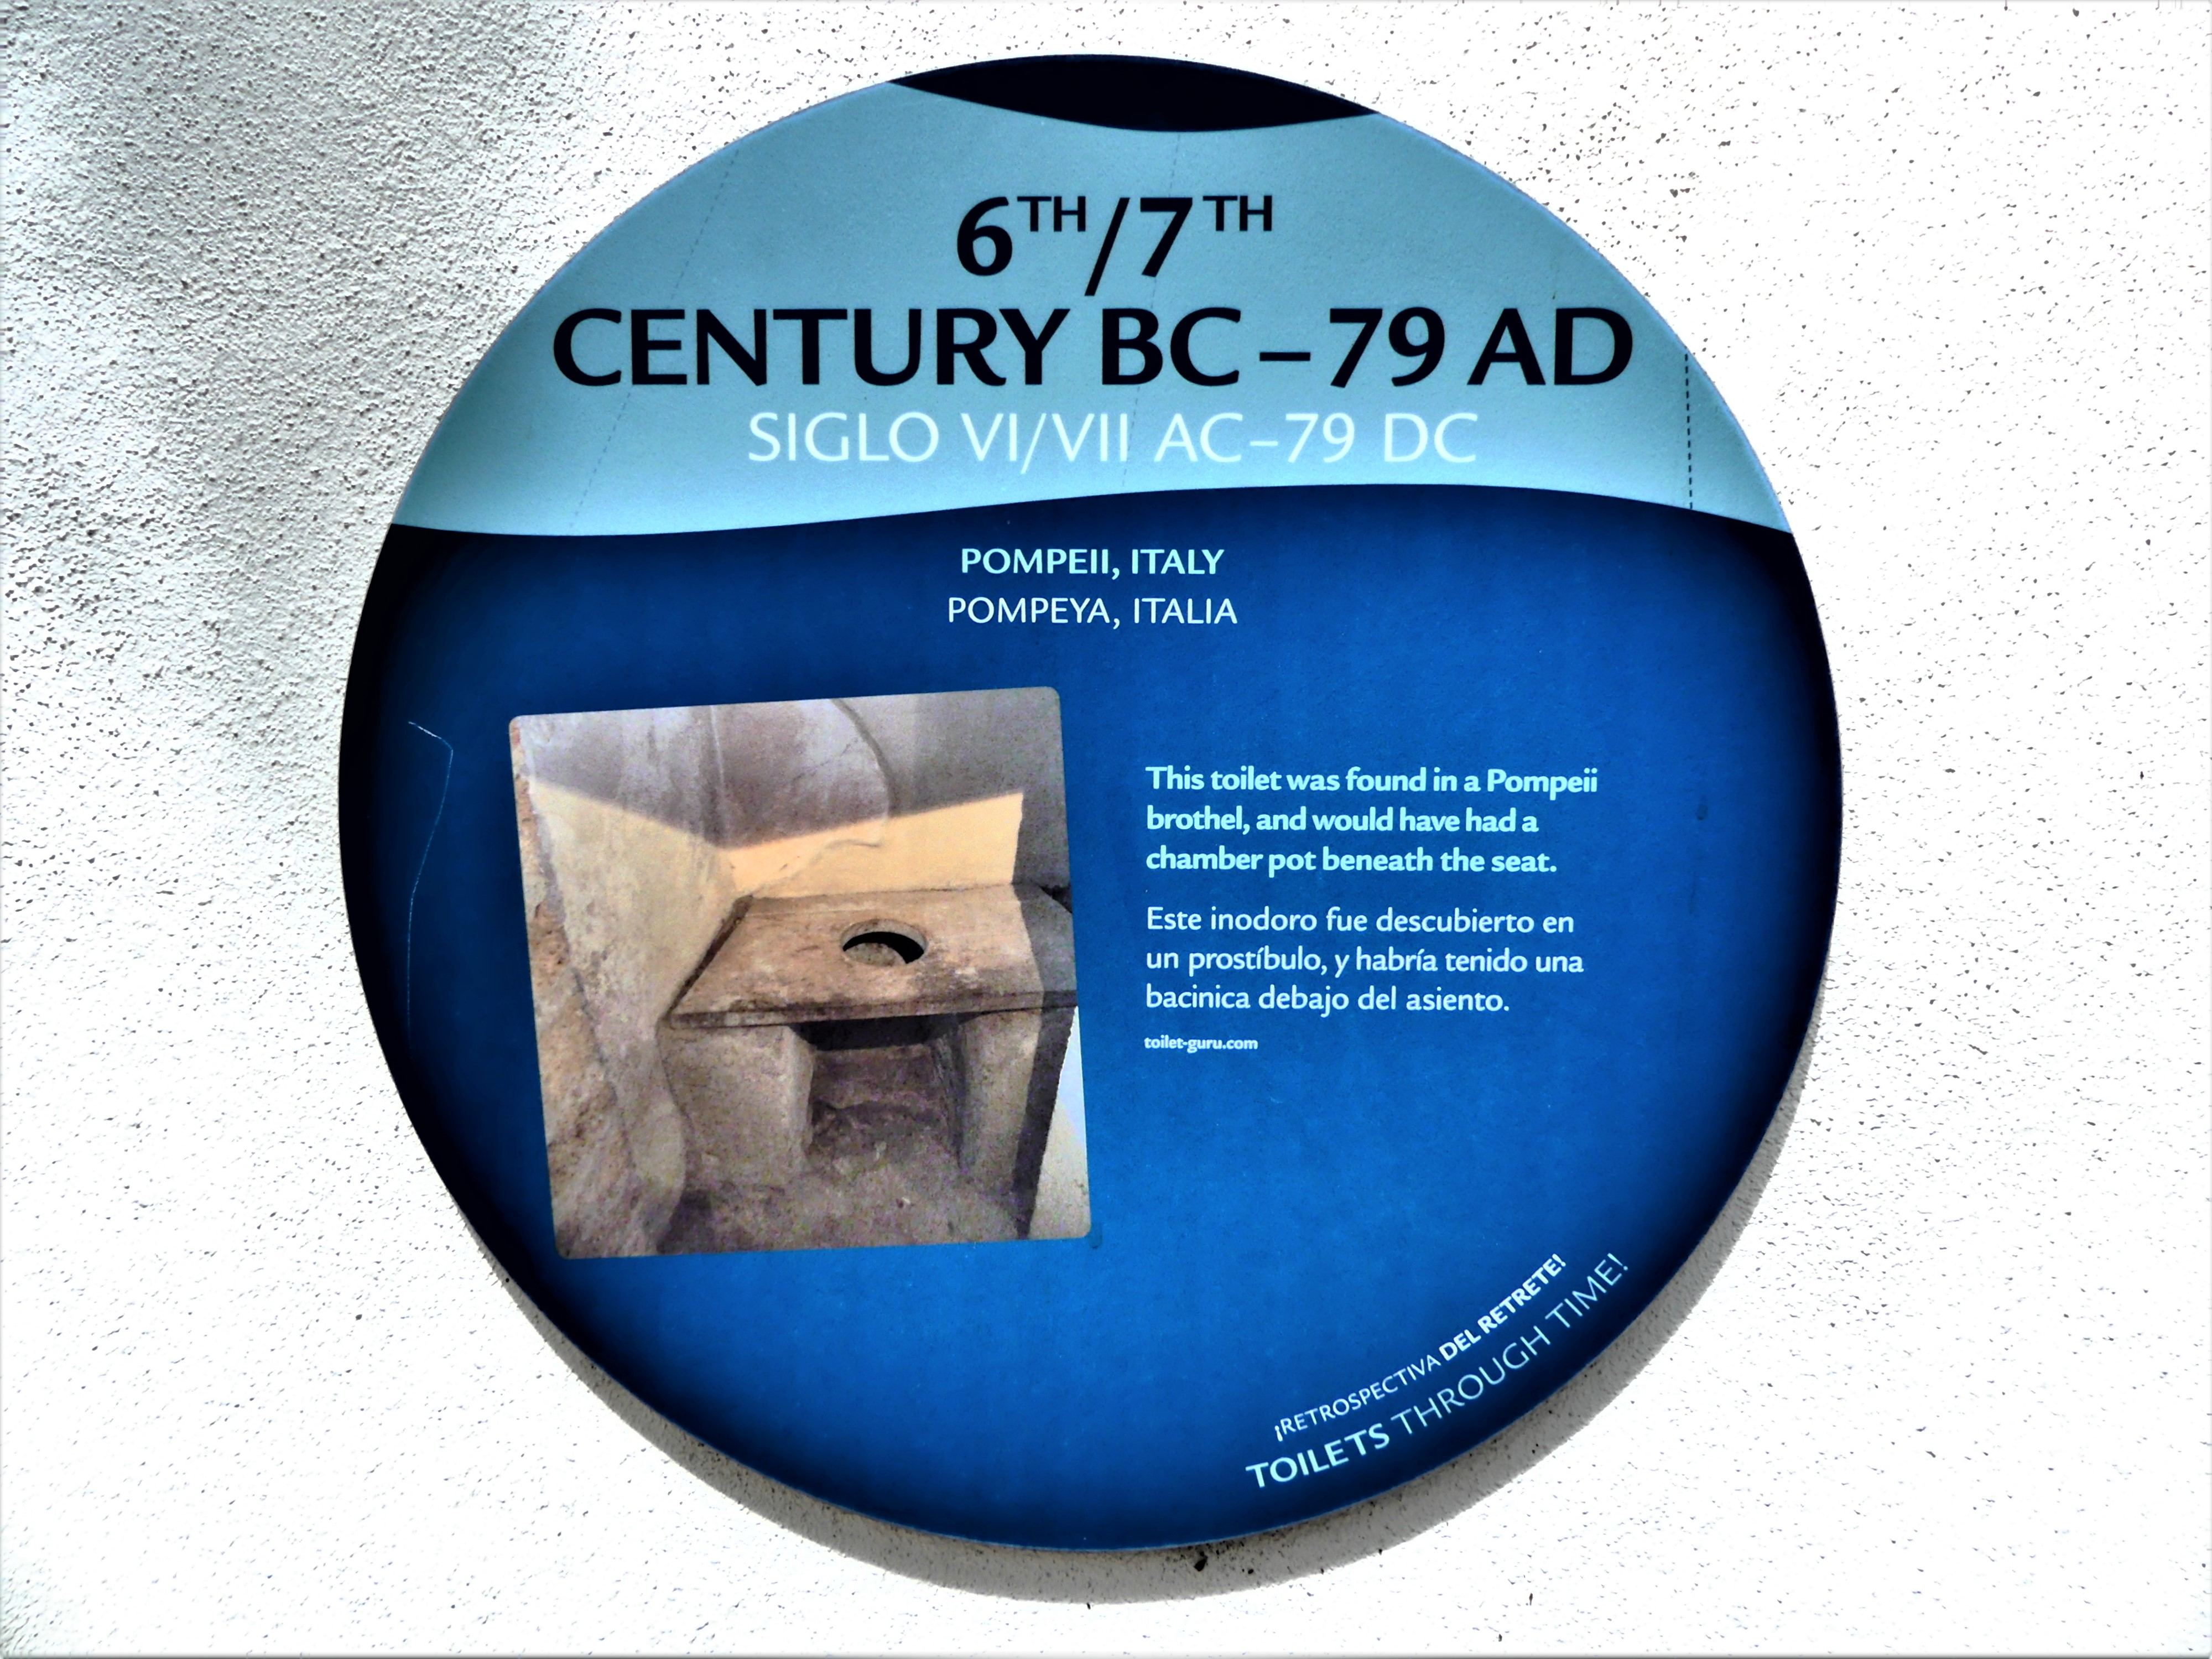 6th & 7th century BC-79 AD